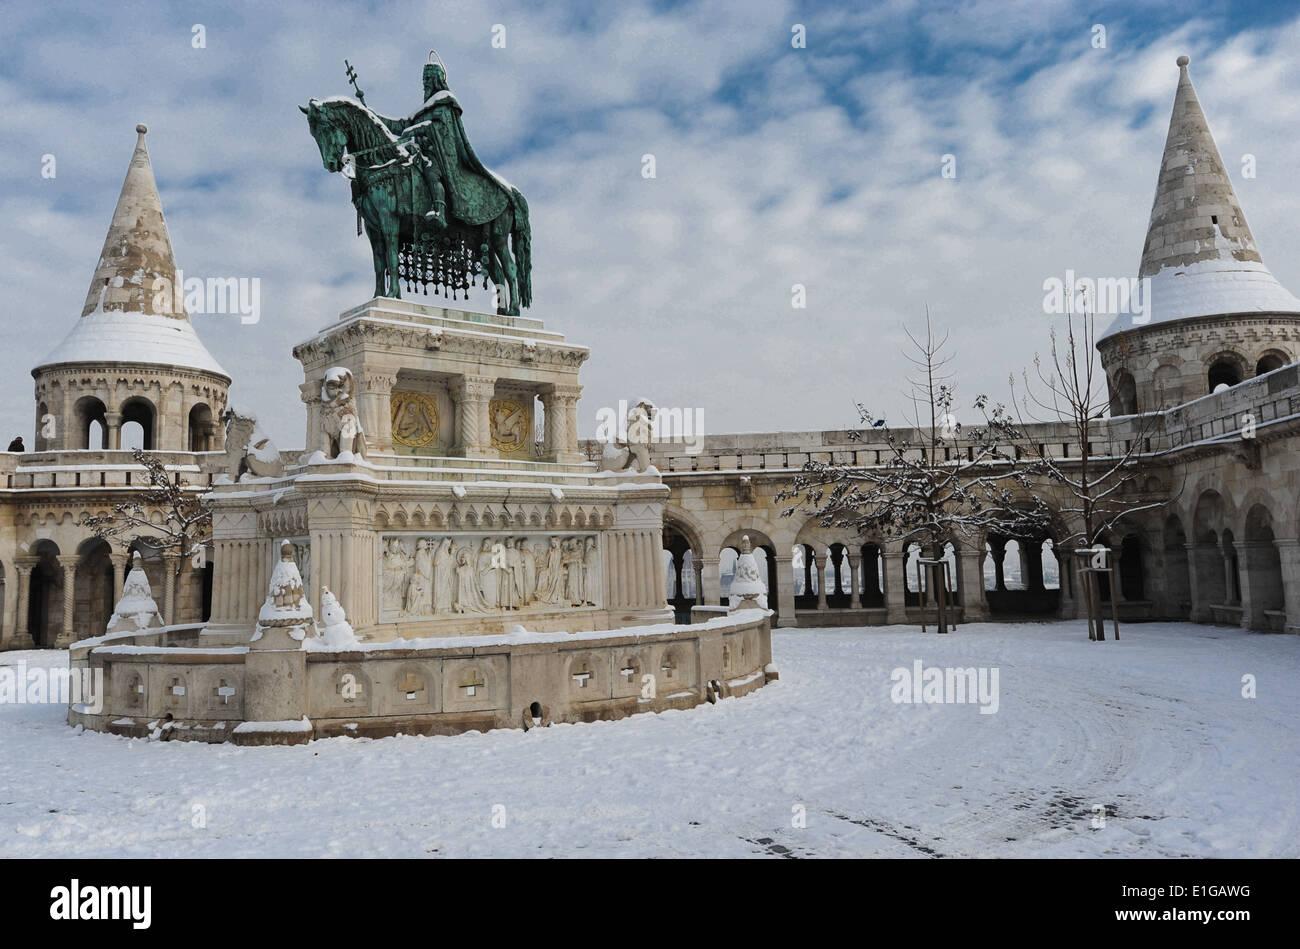 The Fisherman's Bastion (Halaszbastya) of Budapest, Hungary. The Fisherman's Bastion is one of the most visited Stock Photo